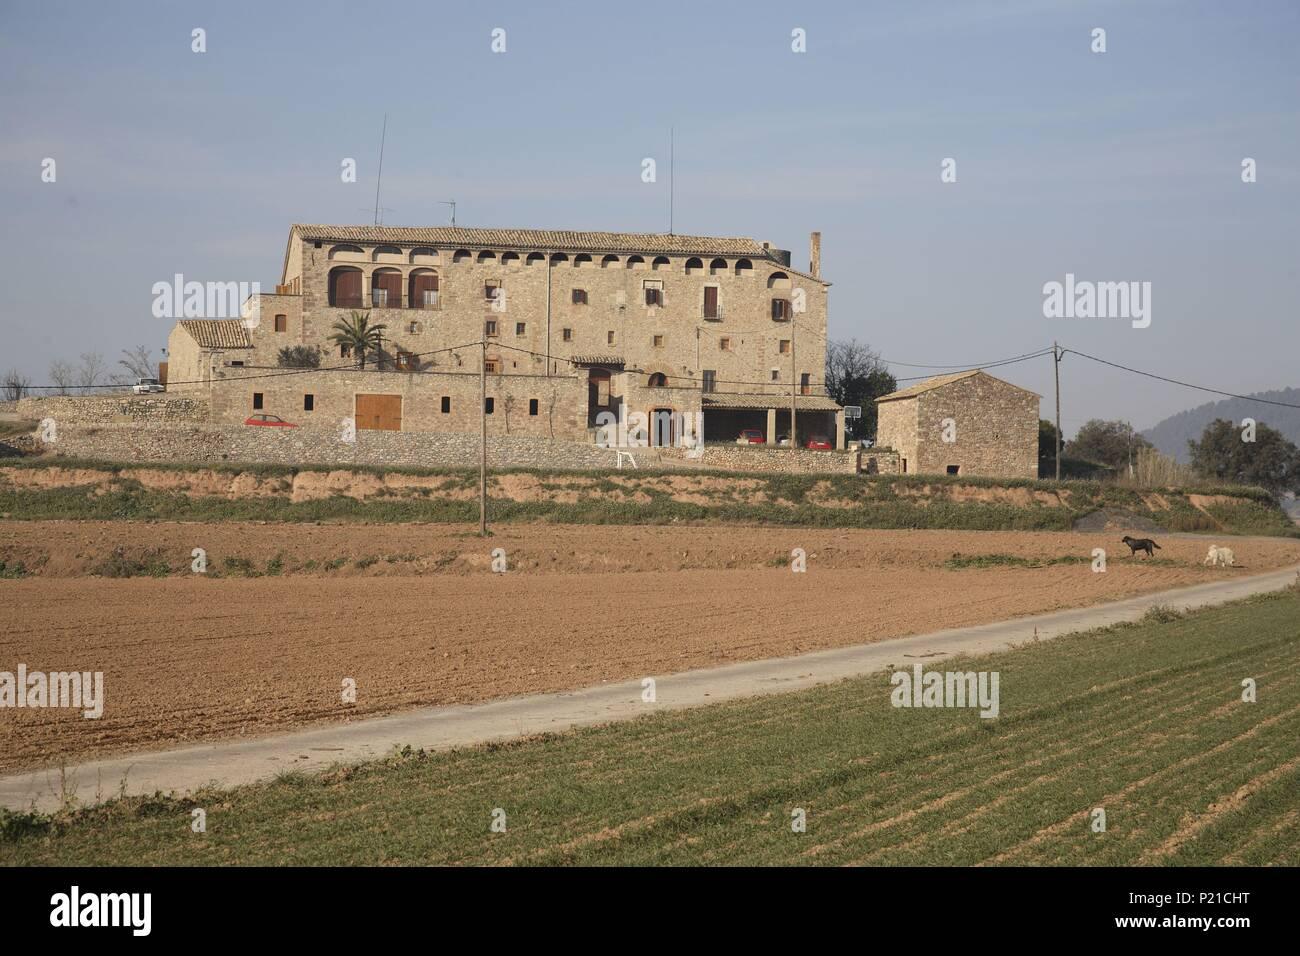 SPAIN - Catalonia - Bagés (district) - Barcelona. Artés; masía fortificada 'Mas les Torres'. - Stock Image